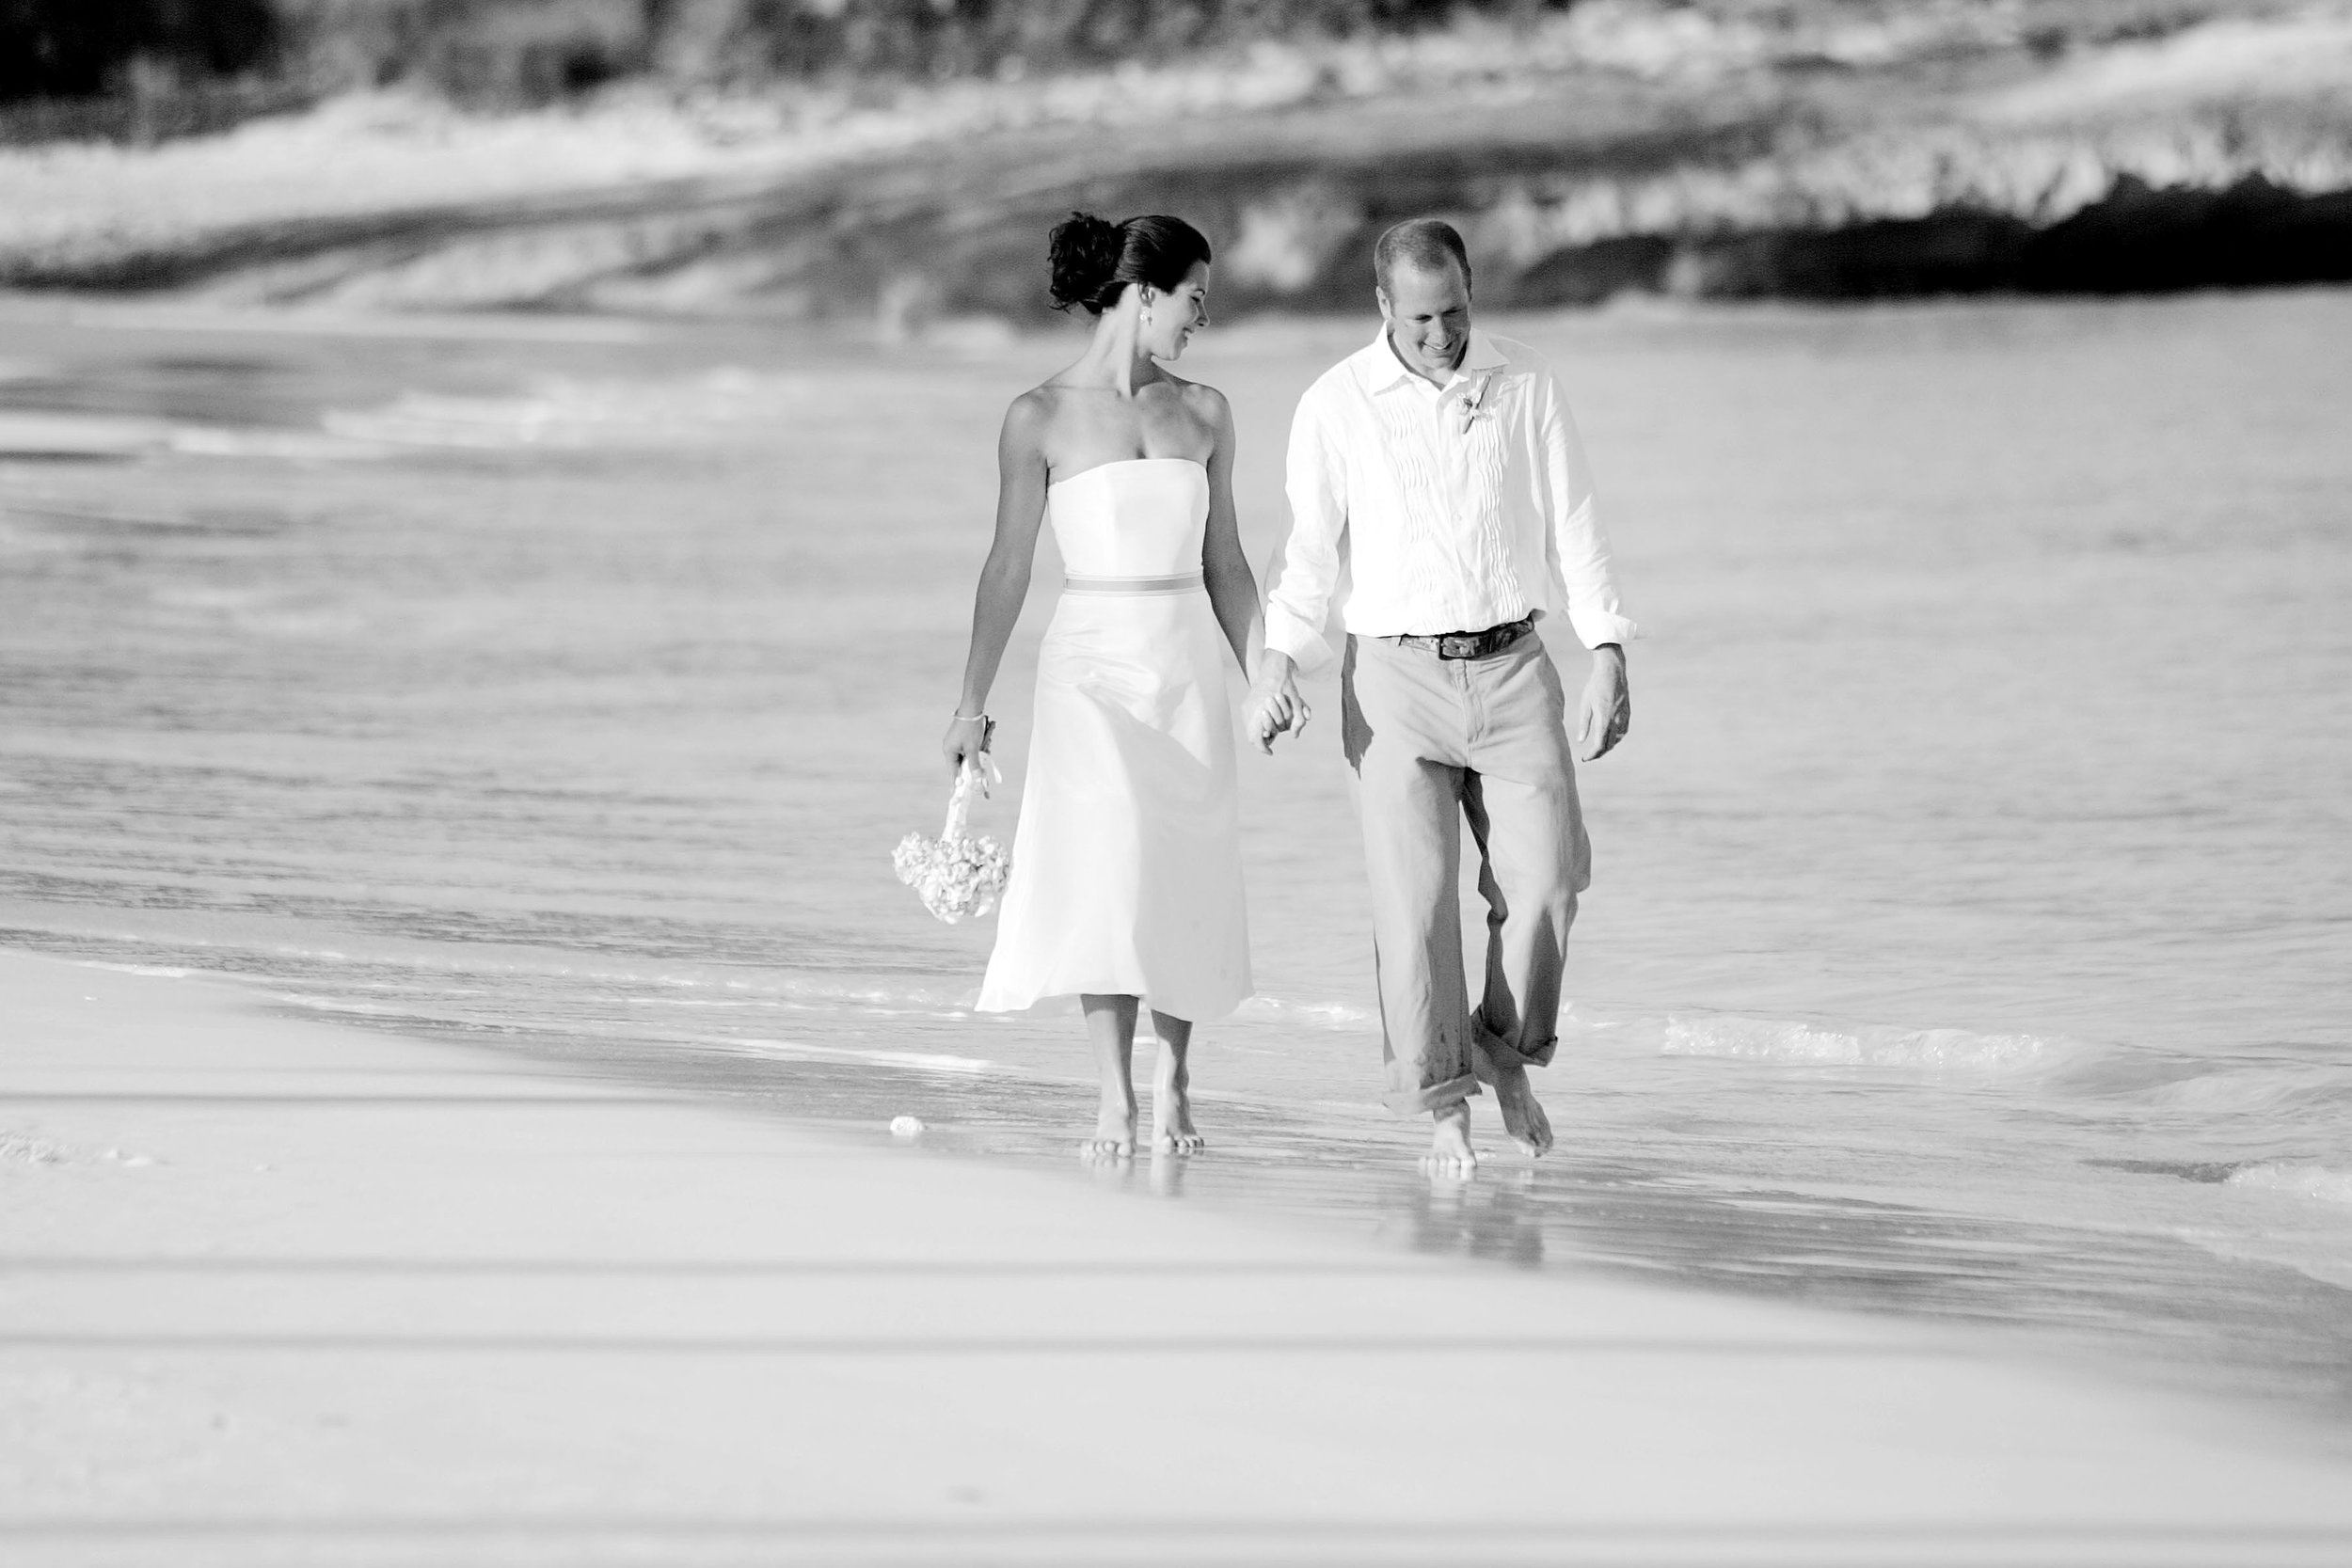 Bahamas Wedding Photography with Toni Axelrod